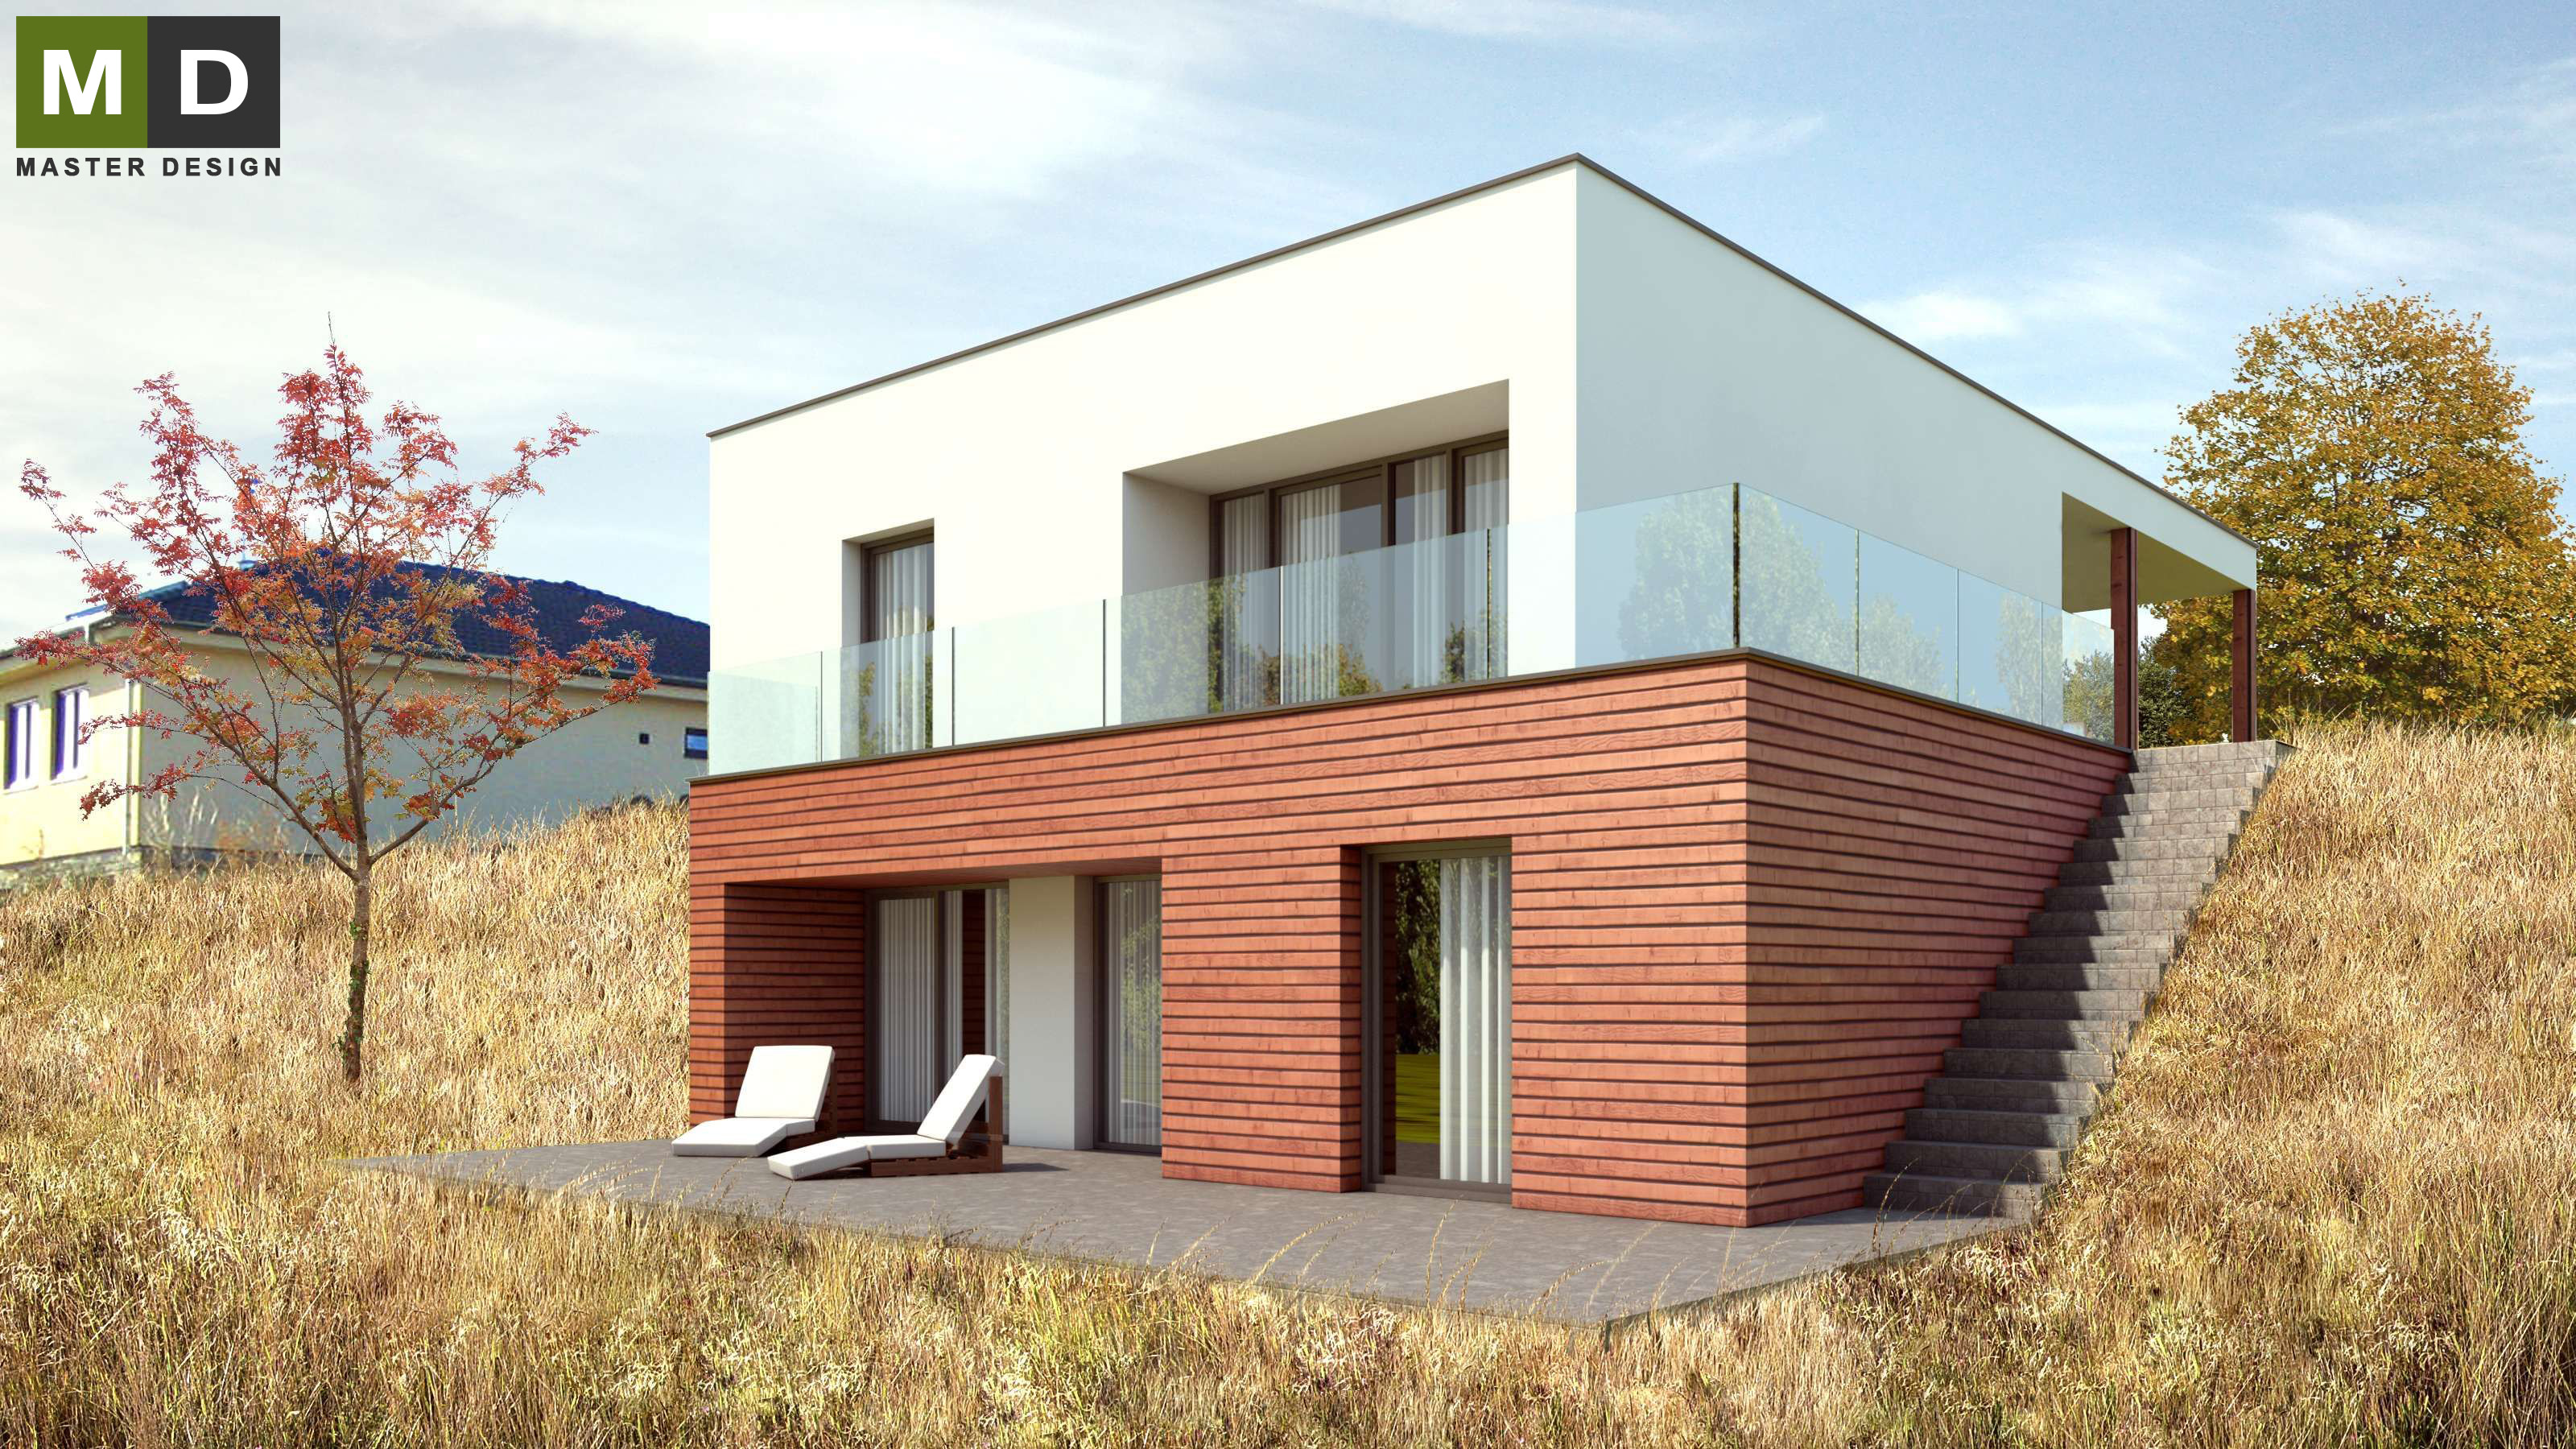 Rodinné Domy Ve Svahu Master Design Architekti